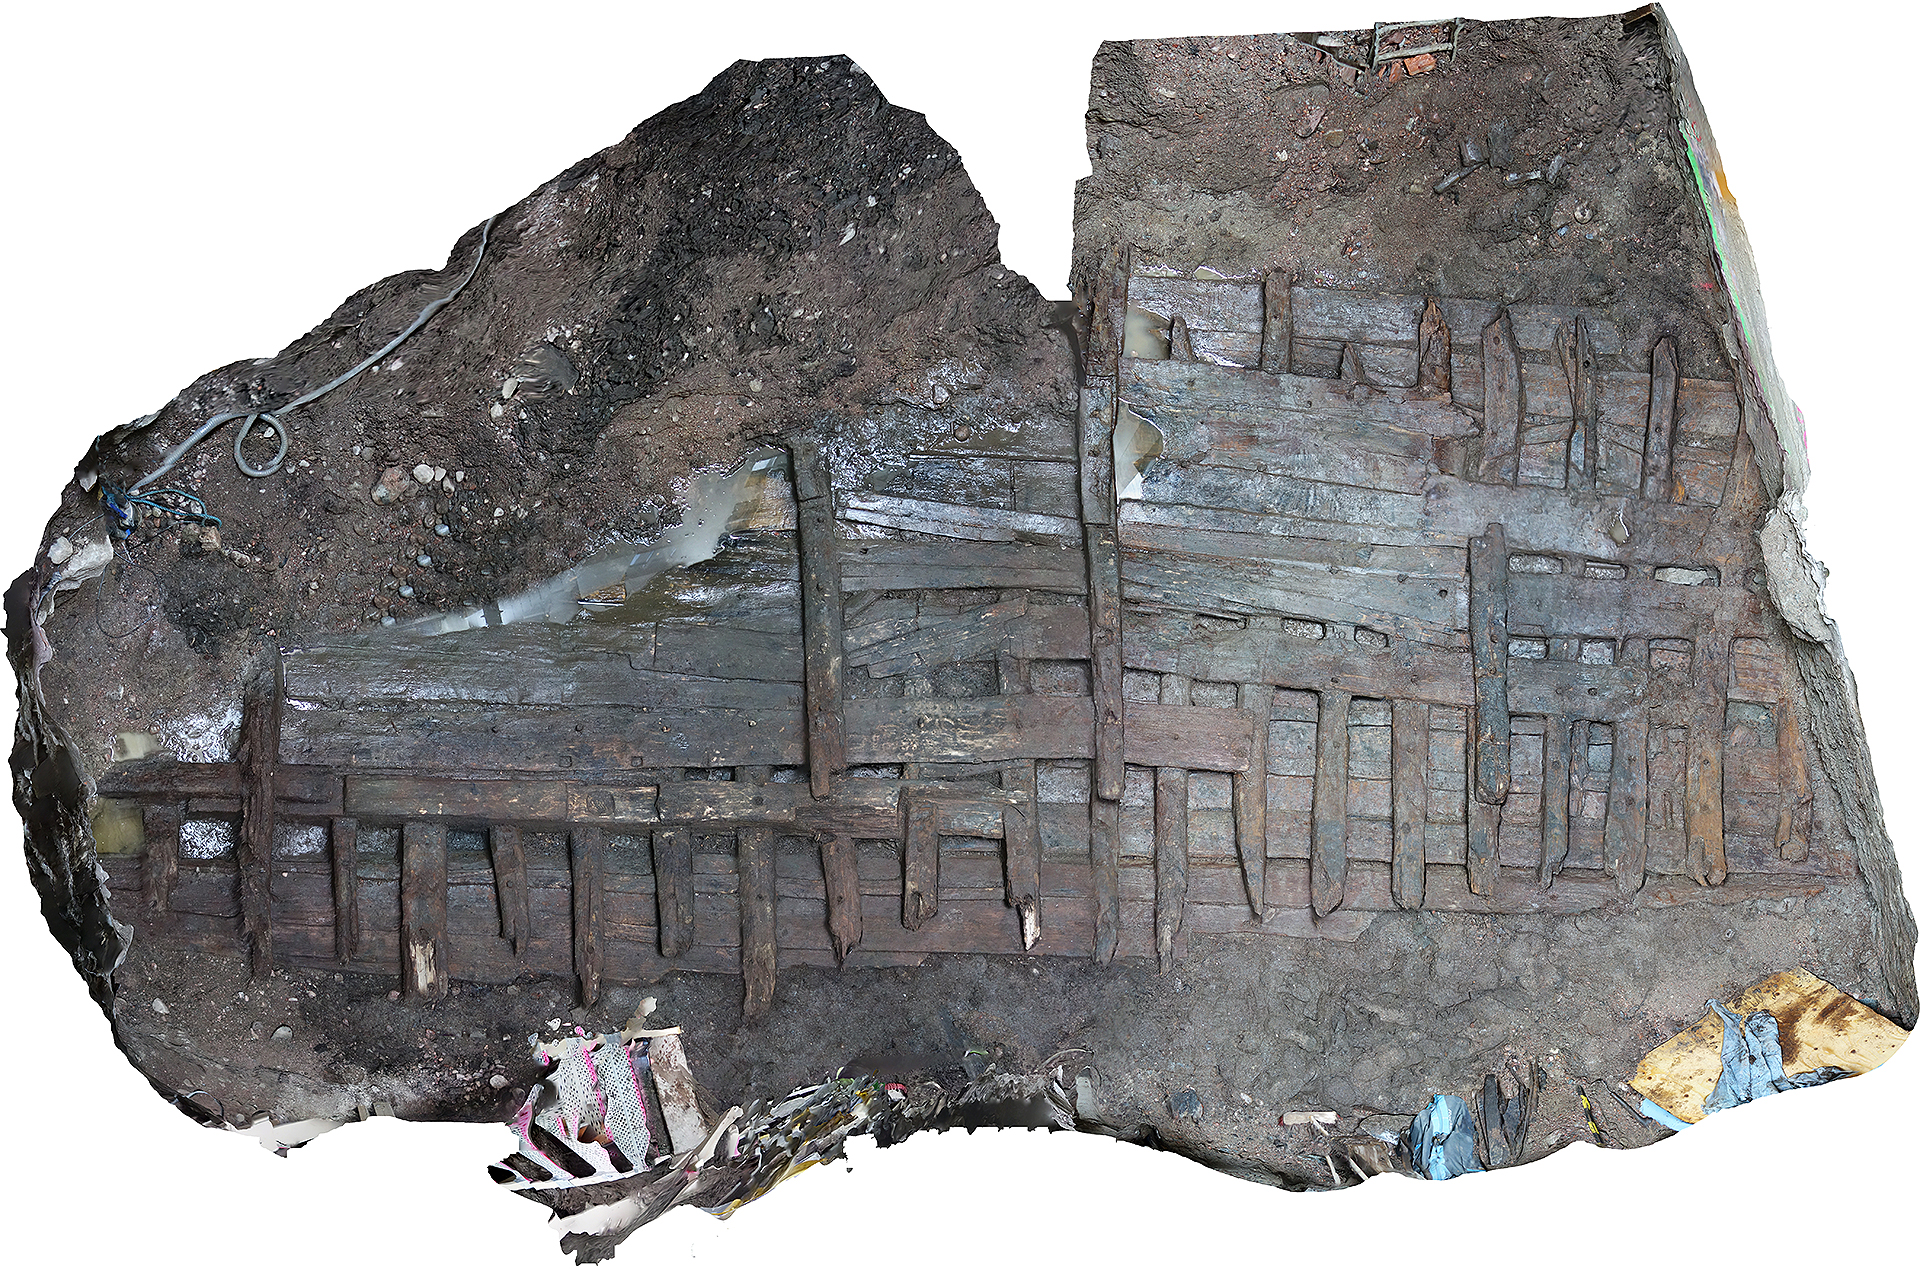 Обломки корабля XVI века нашли в центре Стокгольма: фото